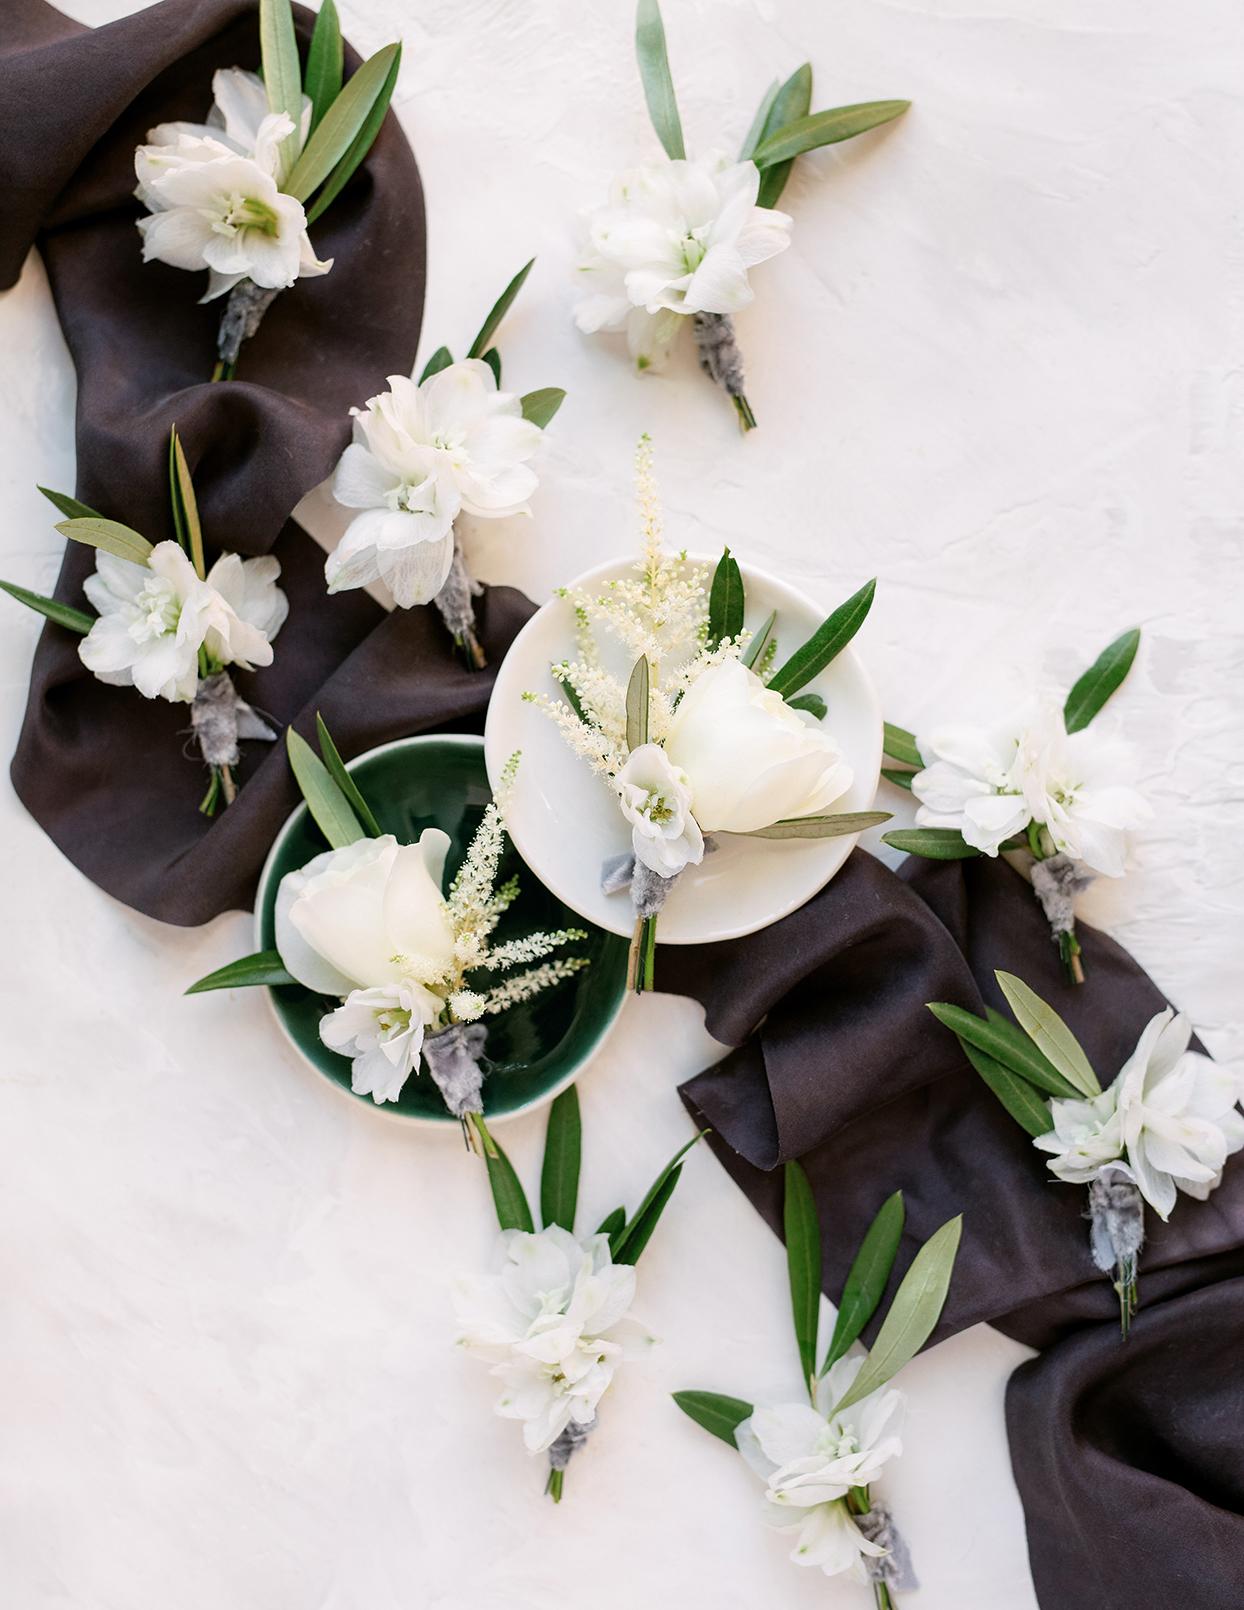 jason justin white floral wedding boutonnieres